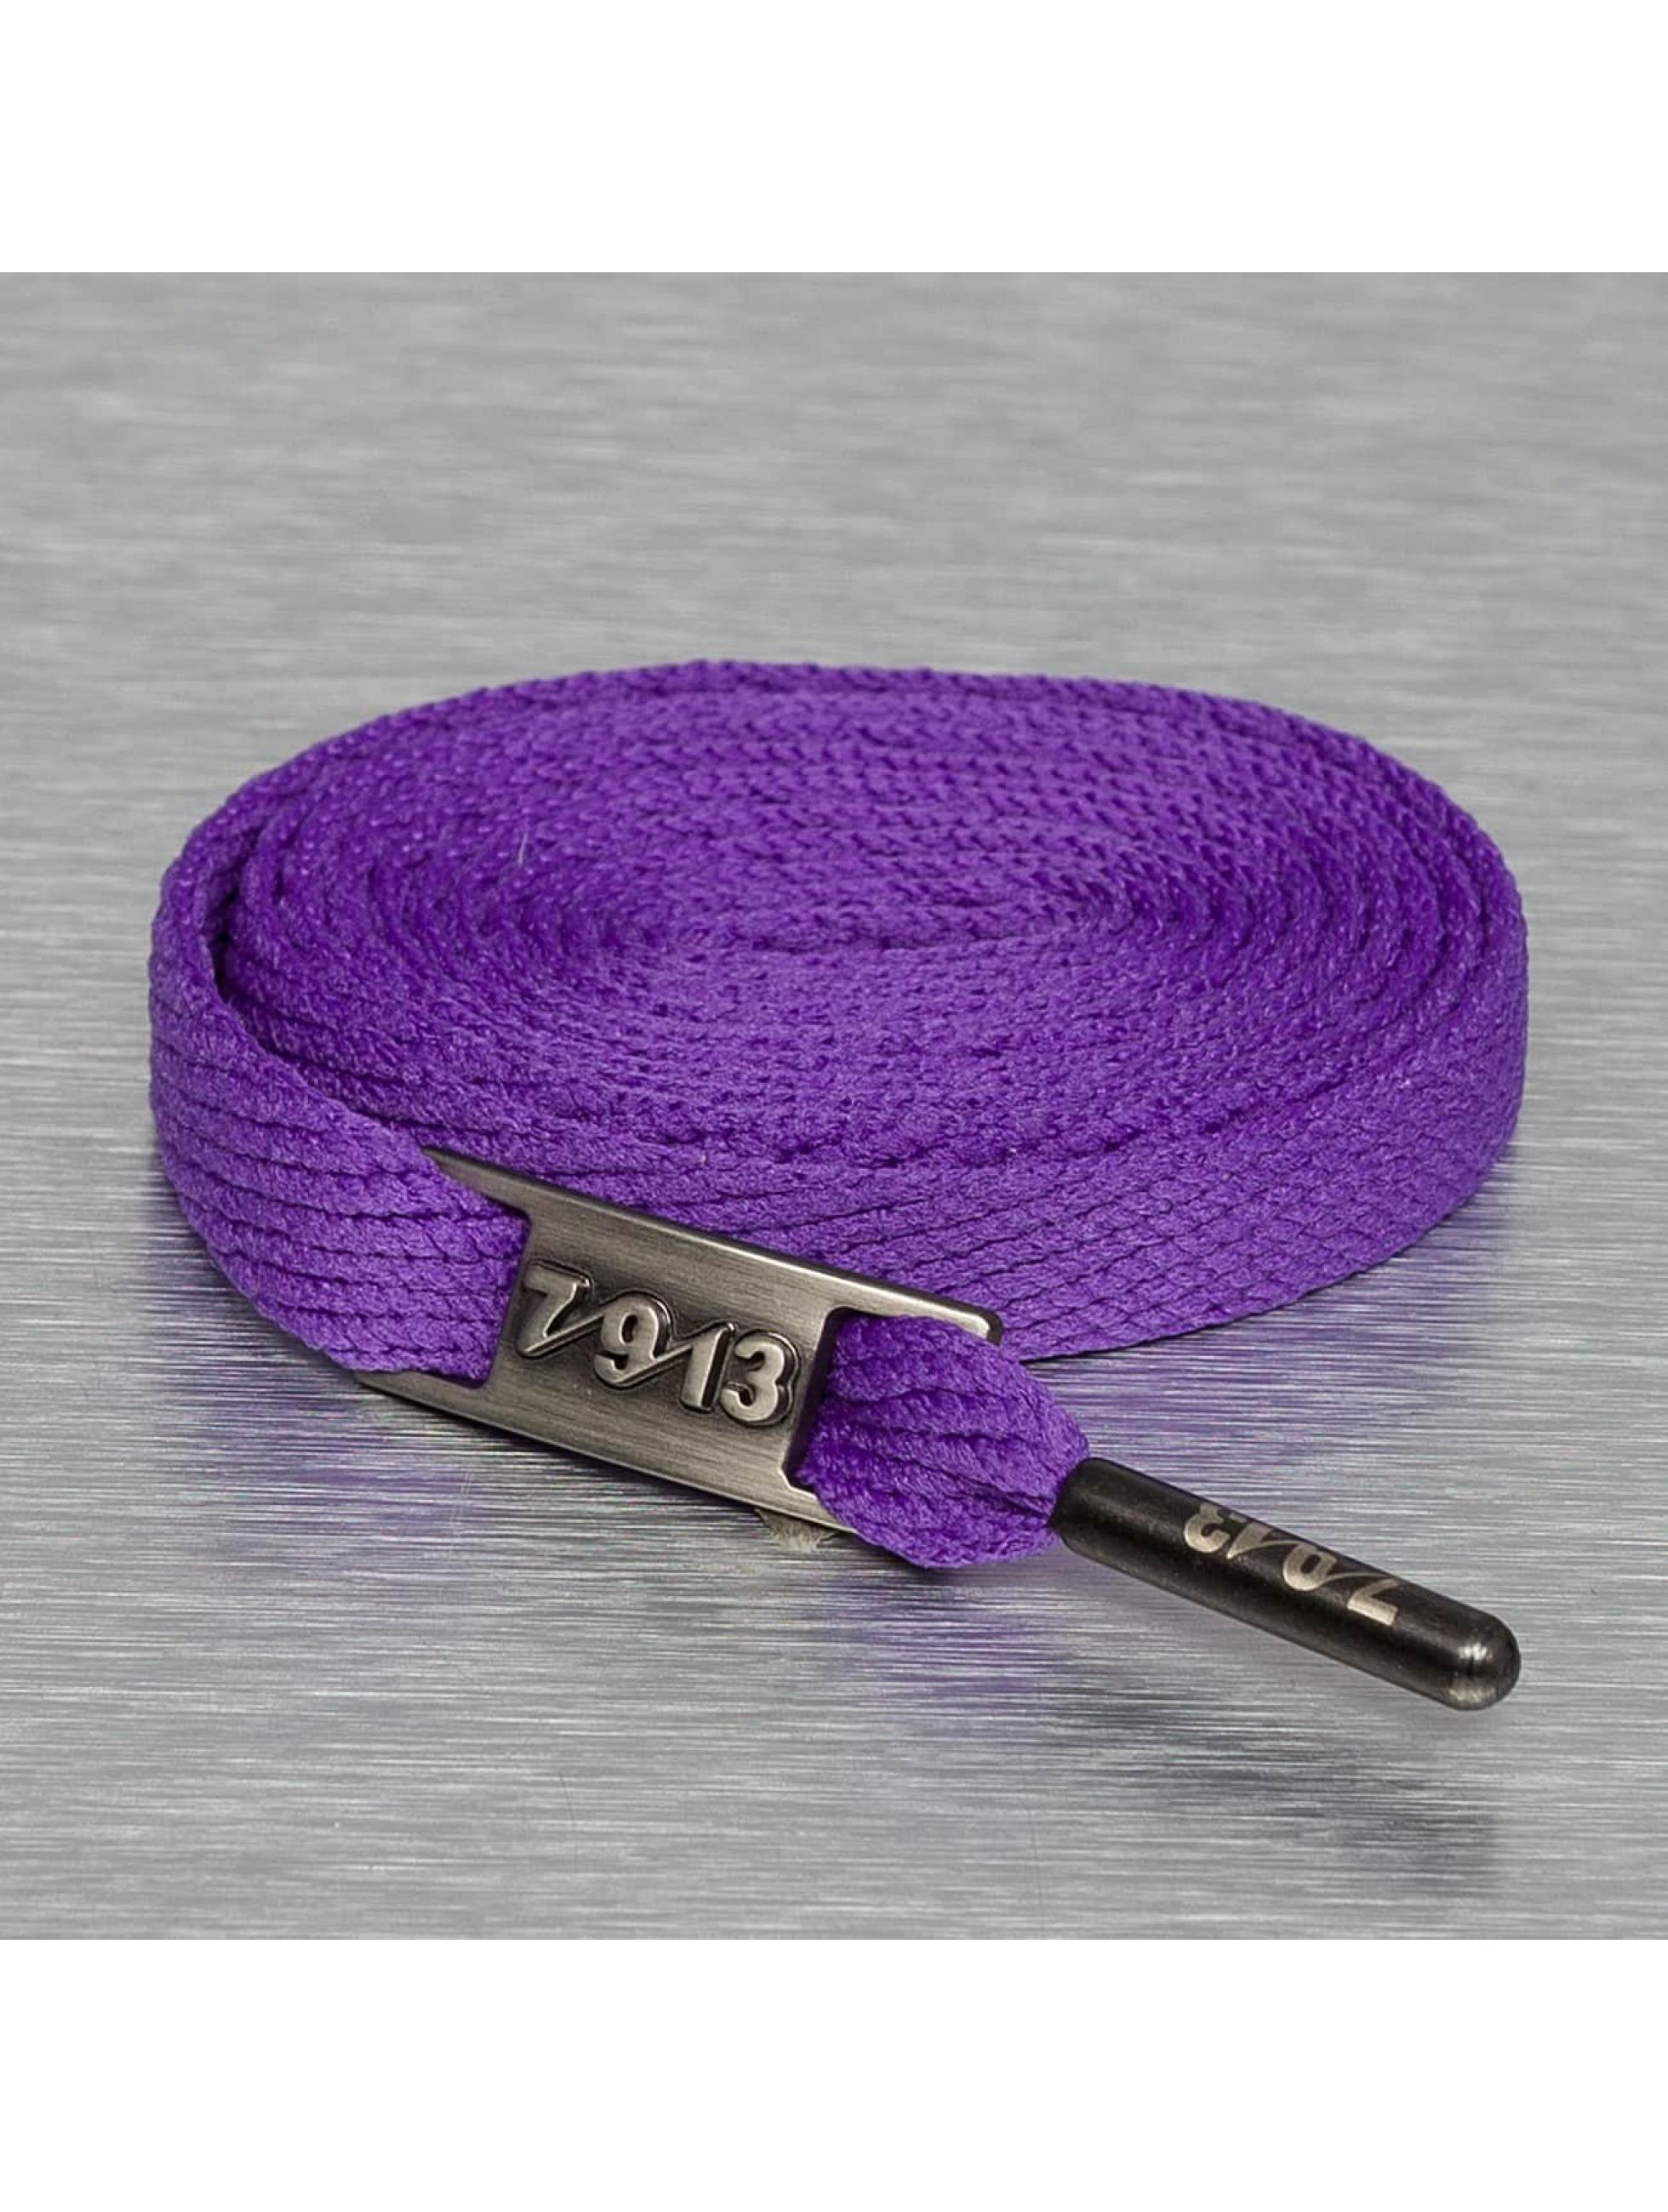 Seven Nine 13 Schnüsenkel Full Metal violet